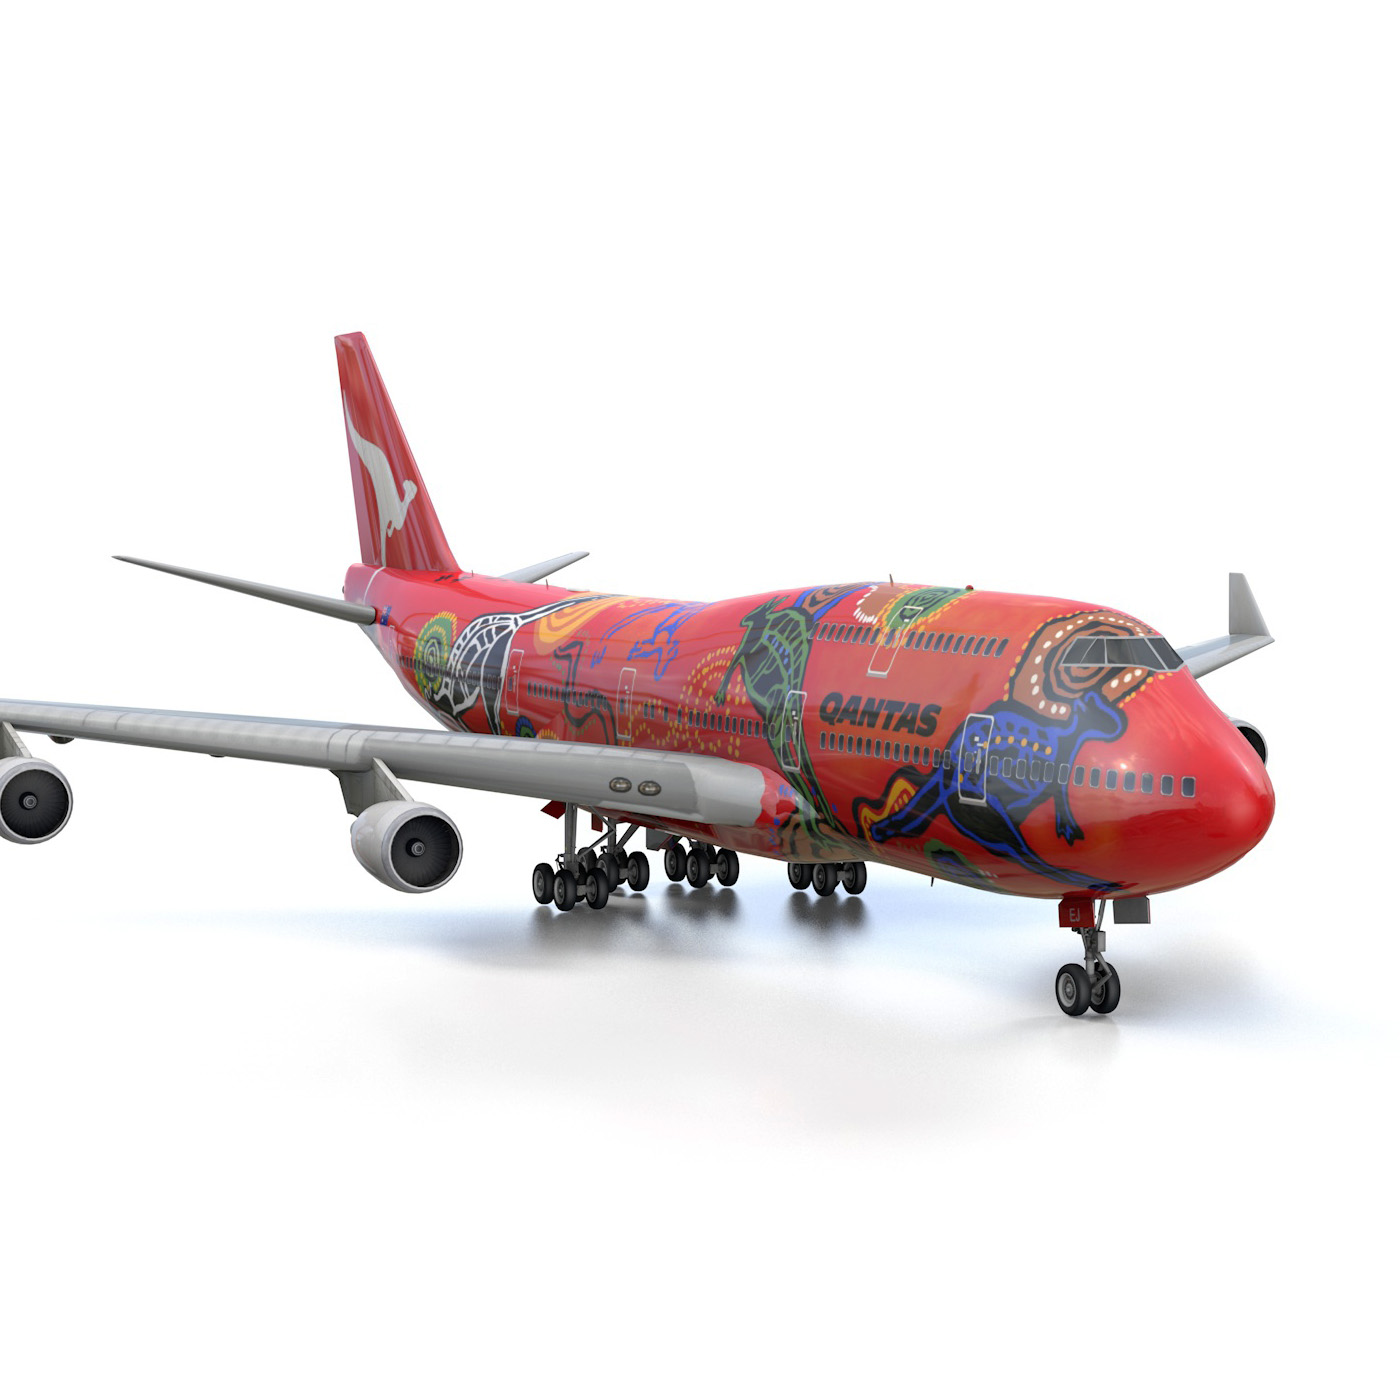 boeing 747 qantas wunala dreaming 3d model 3ds fbx c4d lwo obj 281793